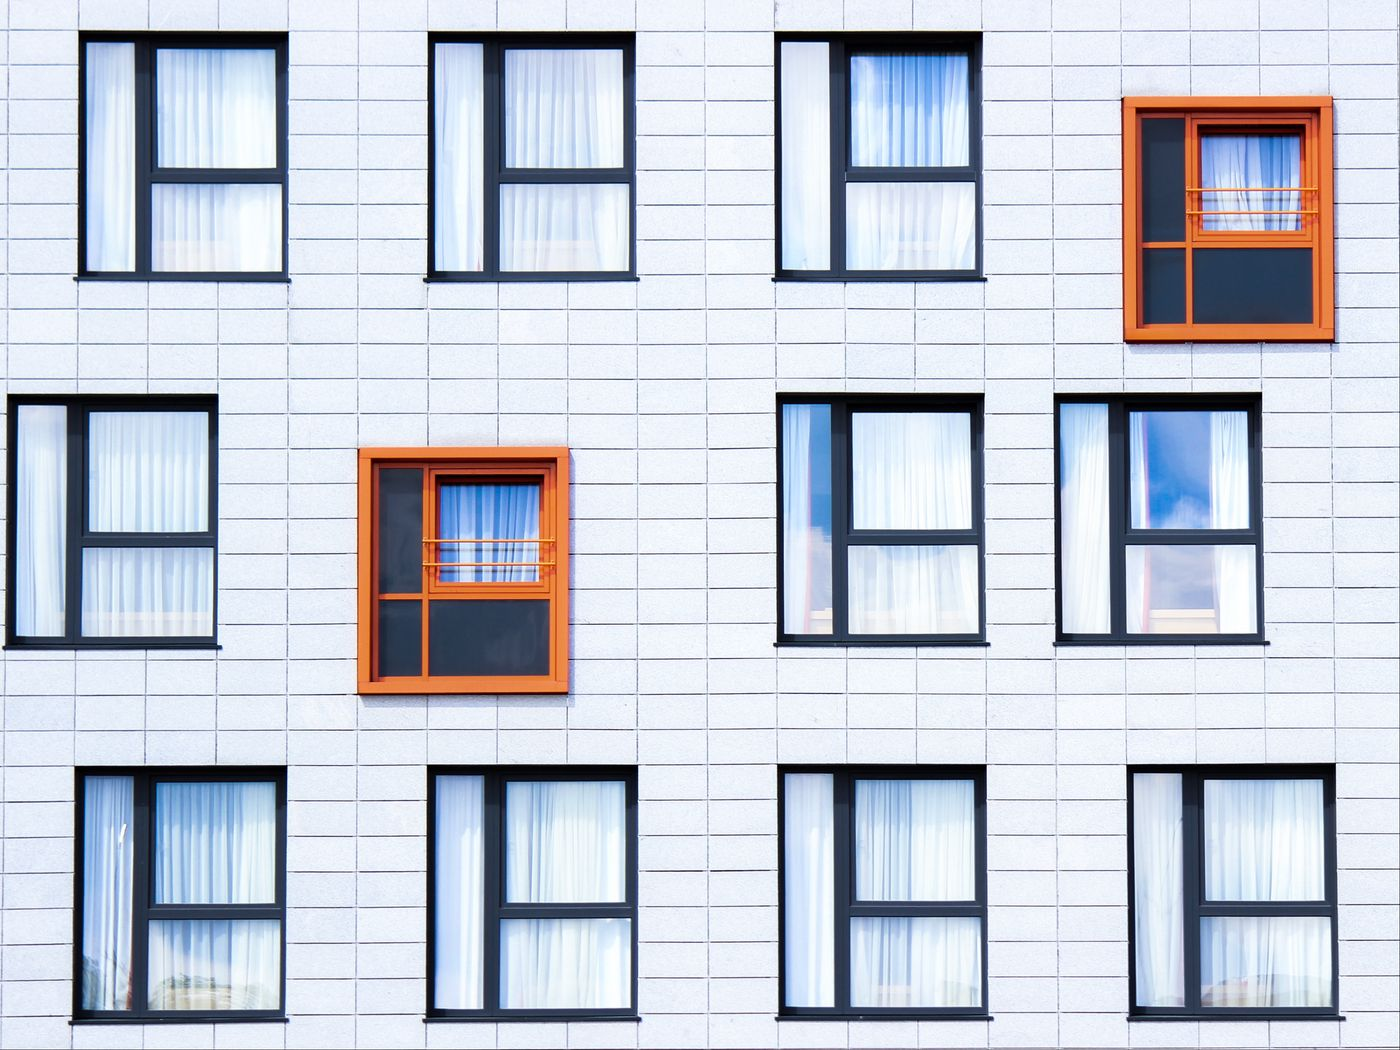 1400x1050 Wallpaper facade, windows, building, minimalism, contrast